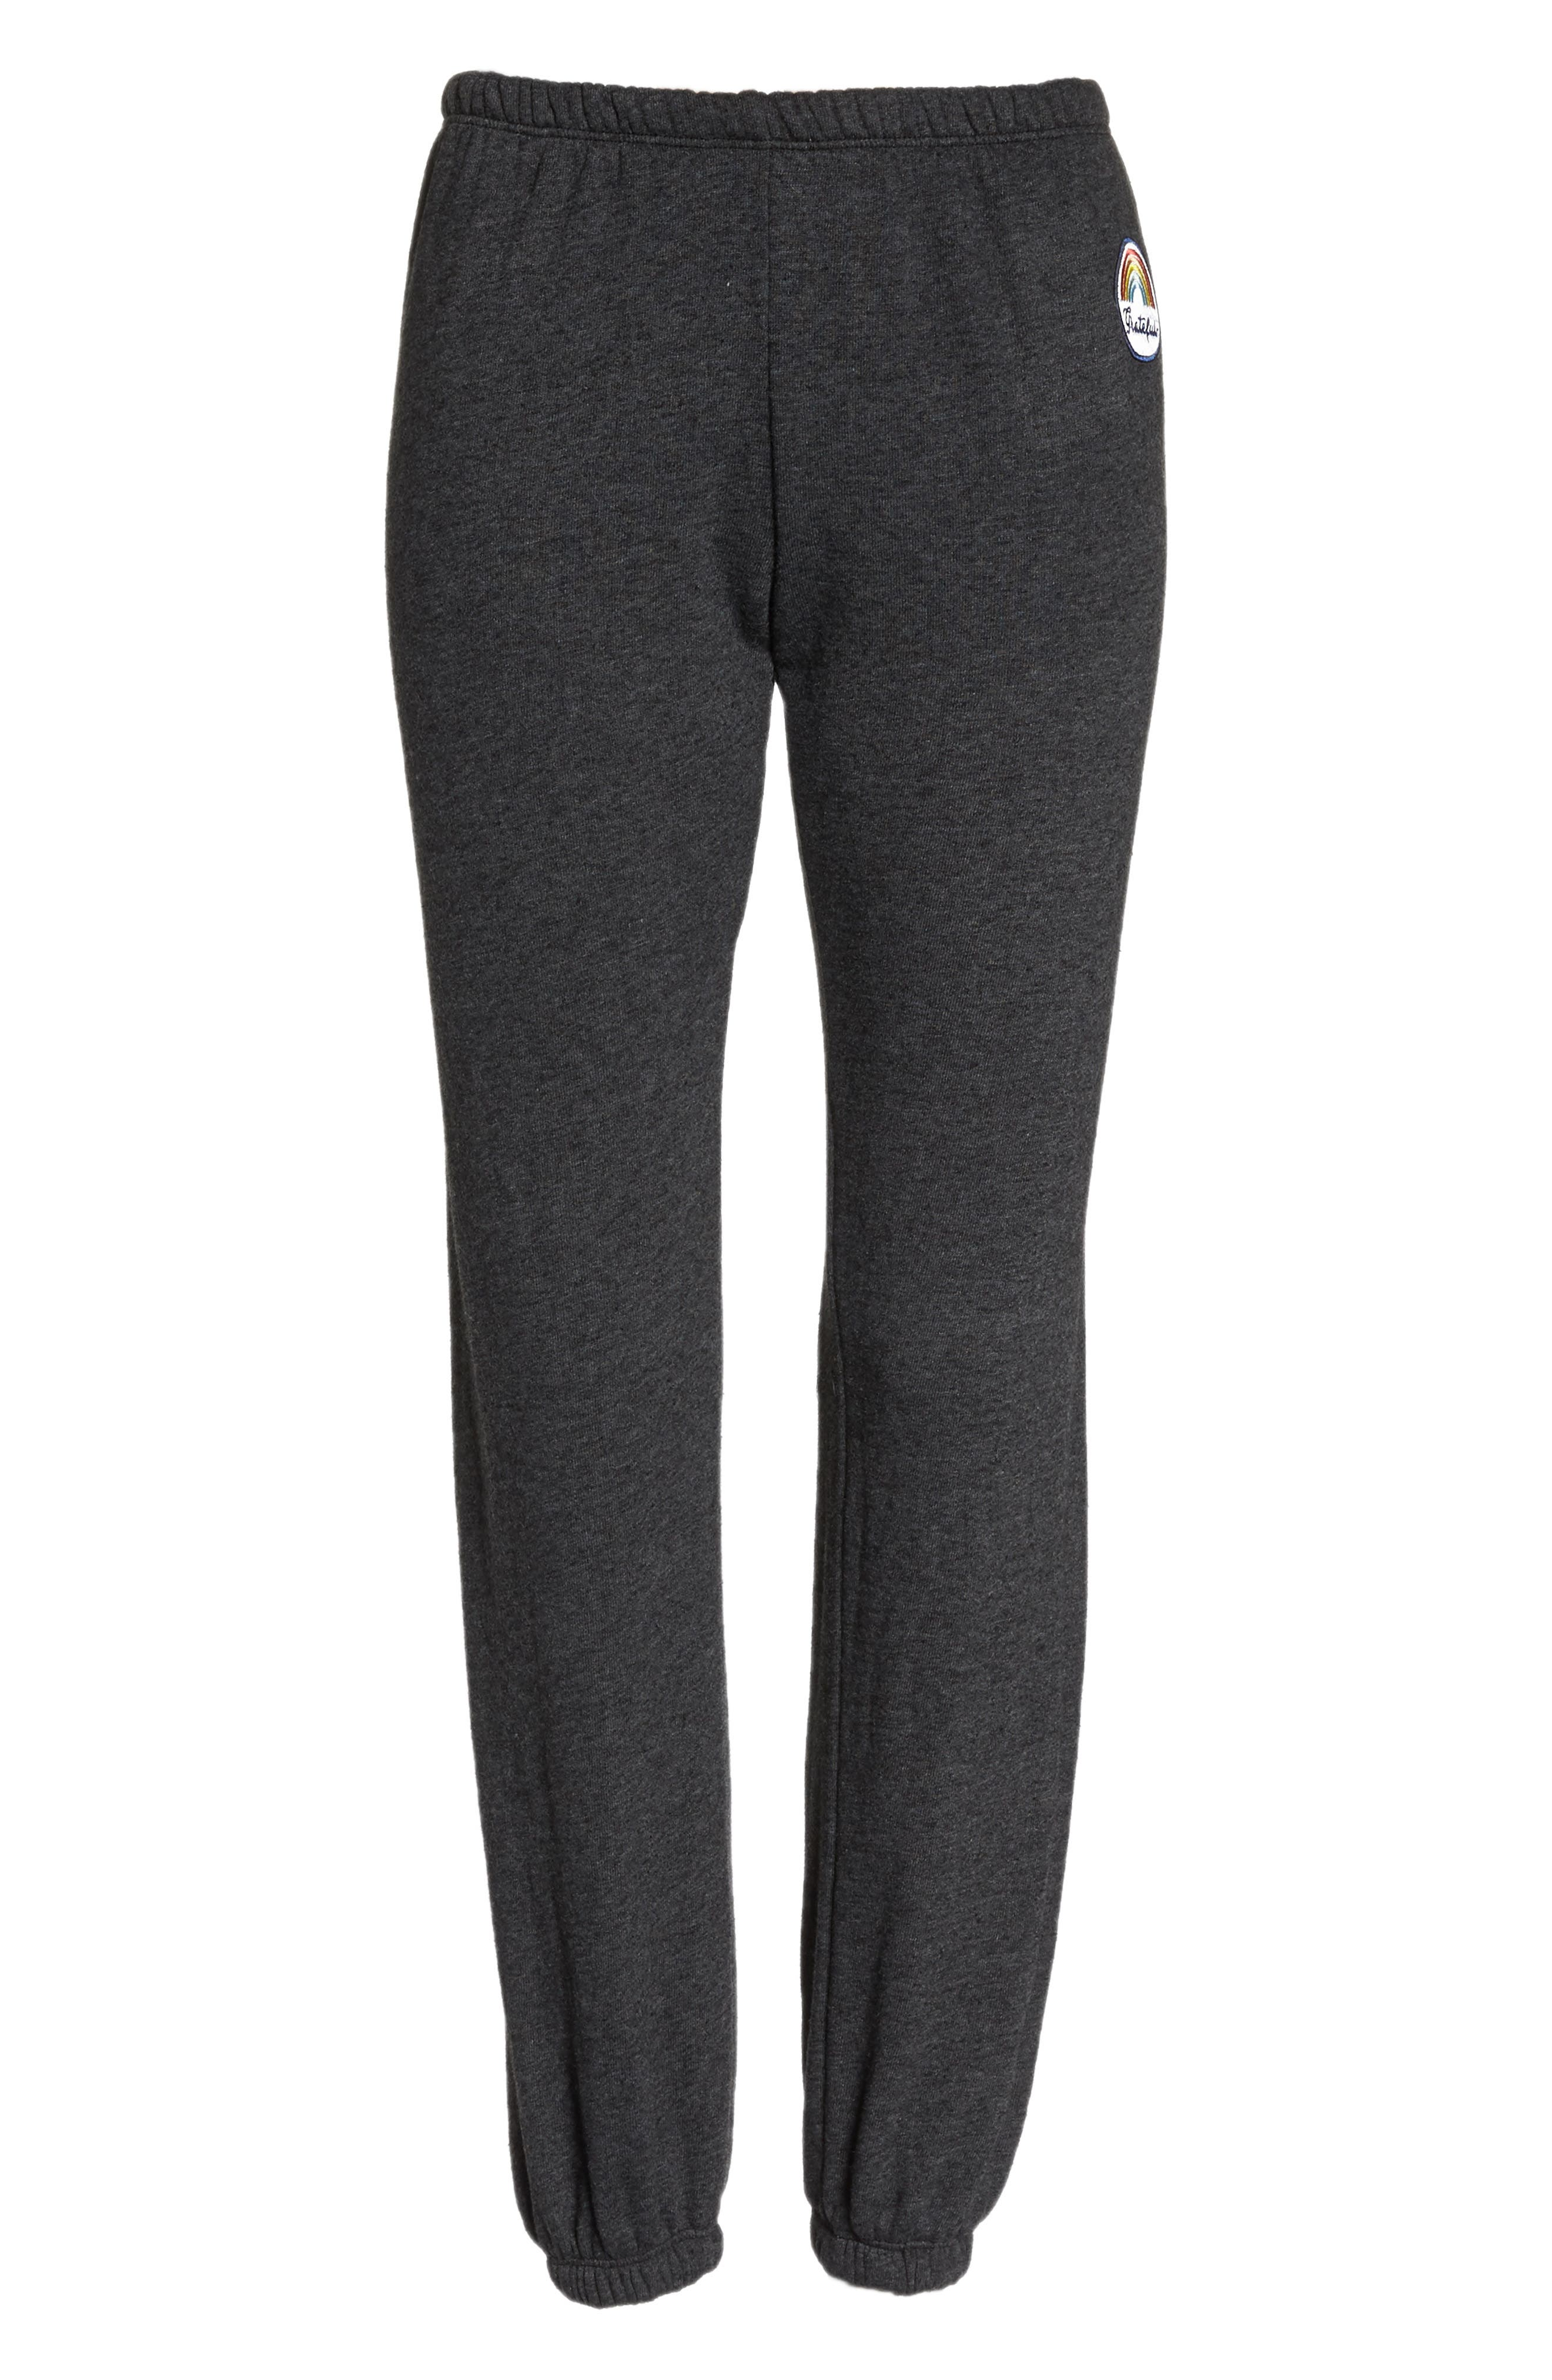 Grateful Perfect Knit Pants,                             Alternate thumbnail 7, color,                             Vntg Black